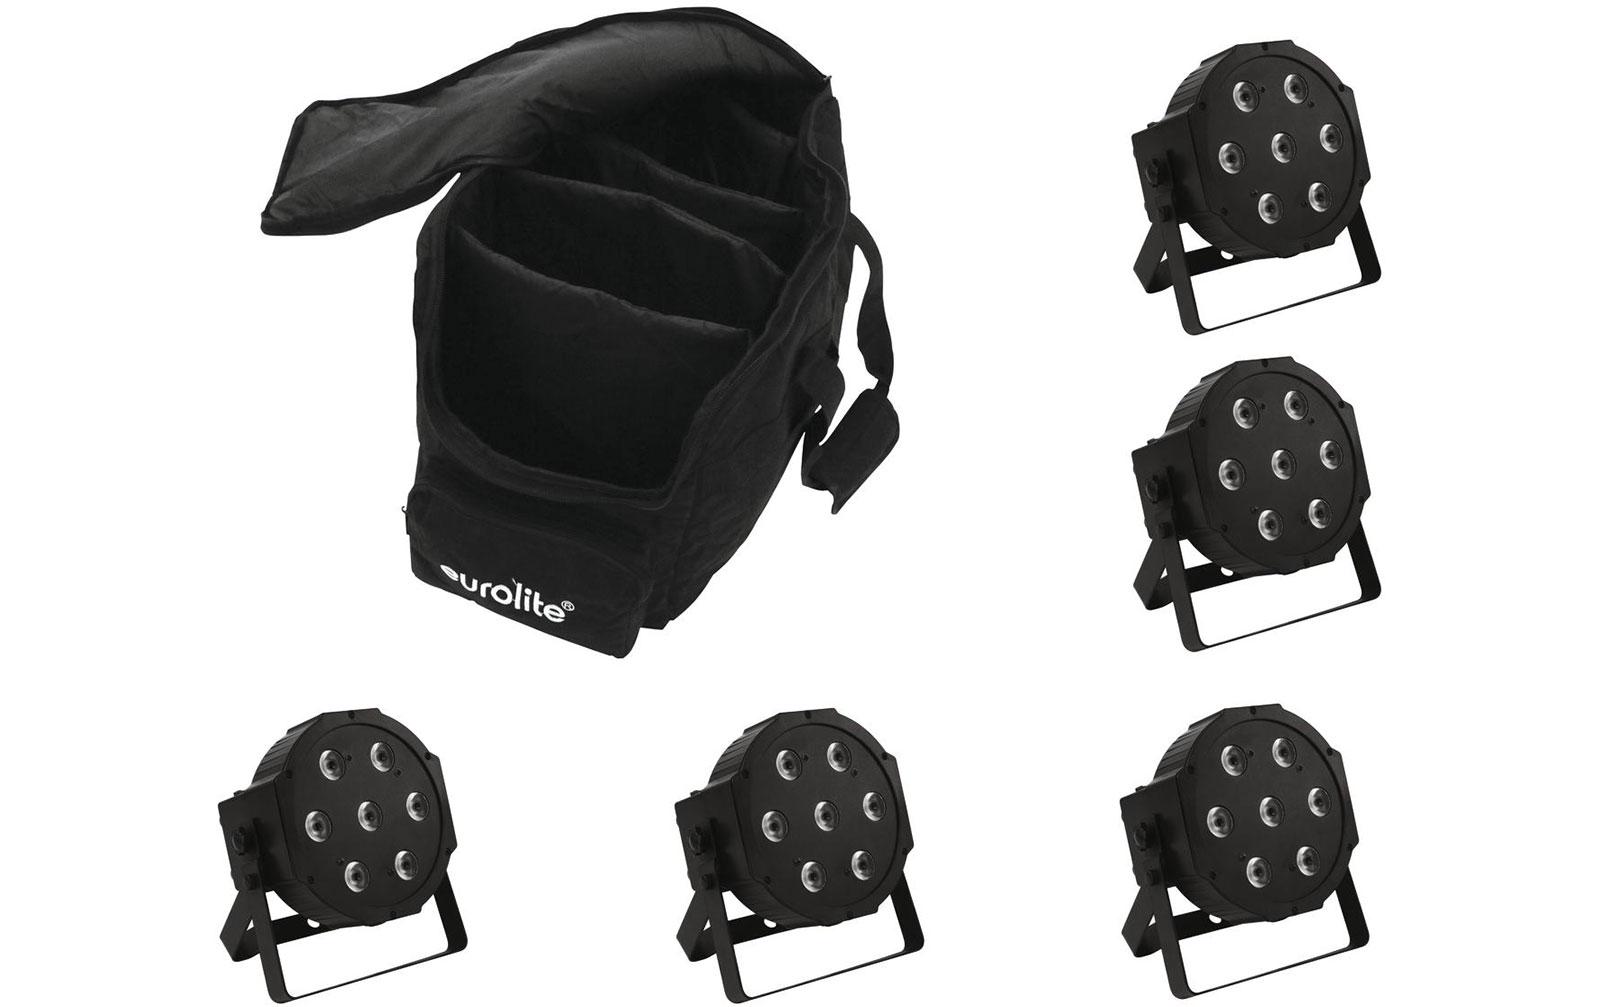 eurolite-set-5x-led-sls-7-qcl-case